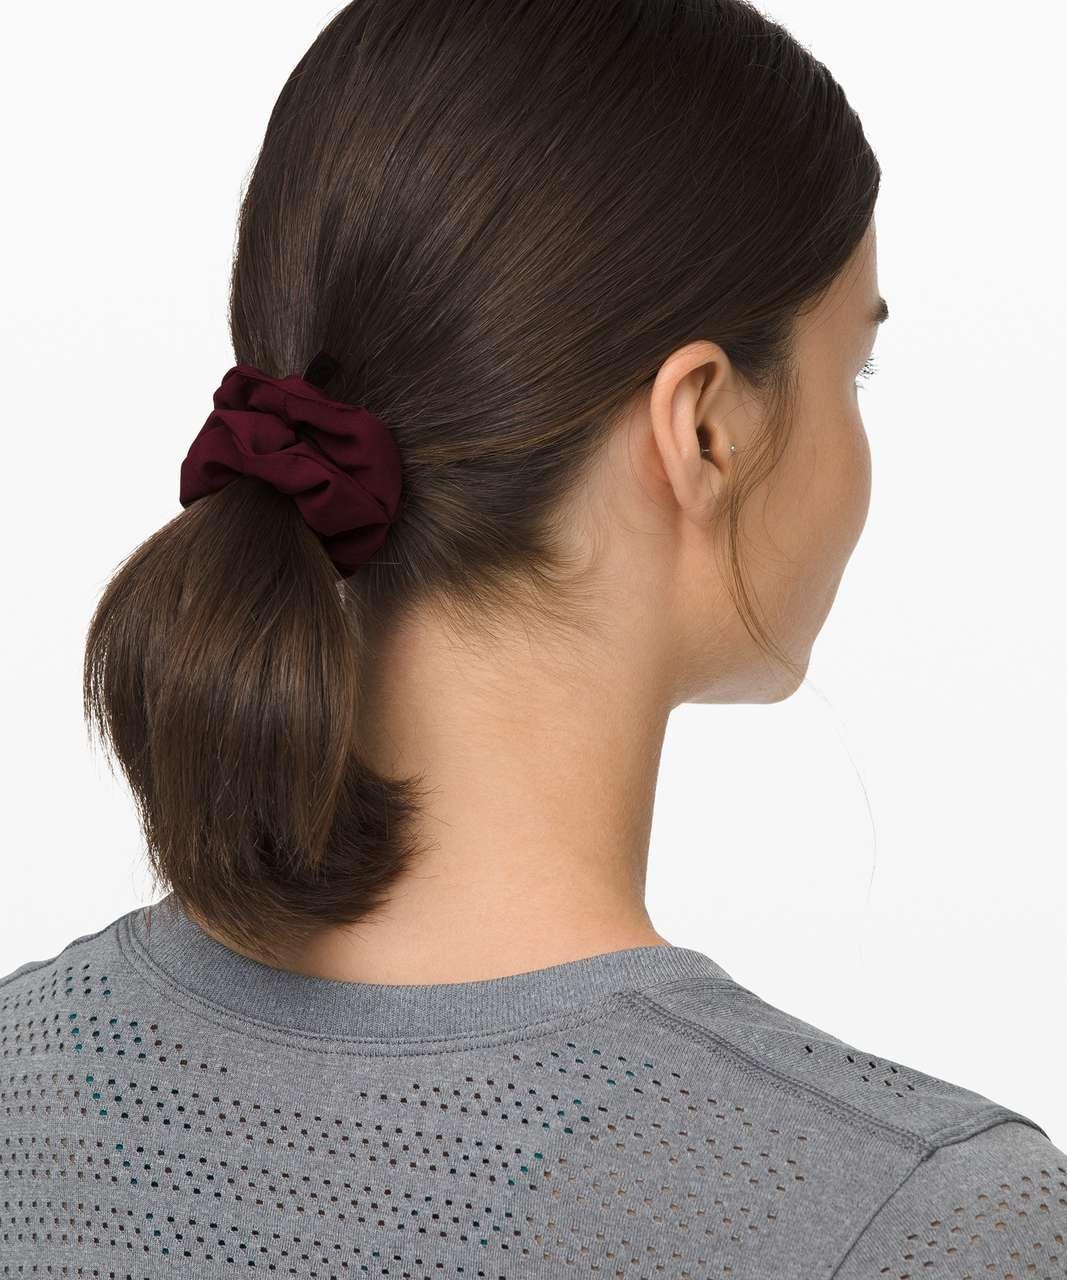 Lululemon Uplifting Scrunchie - Garnet